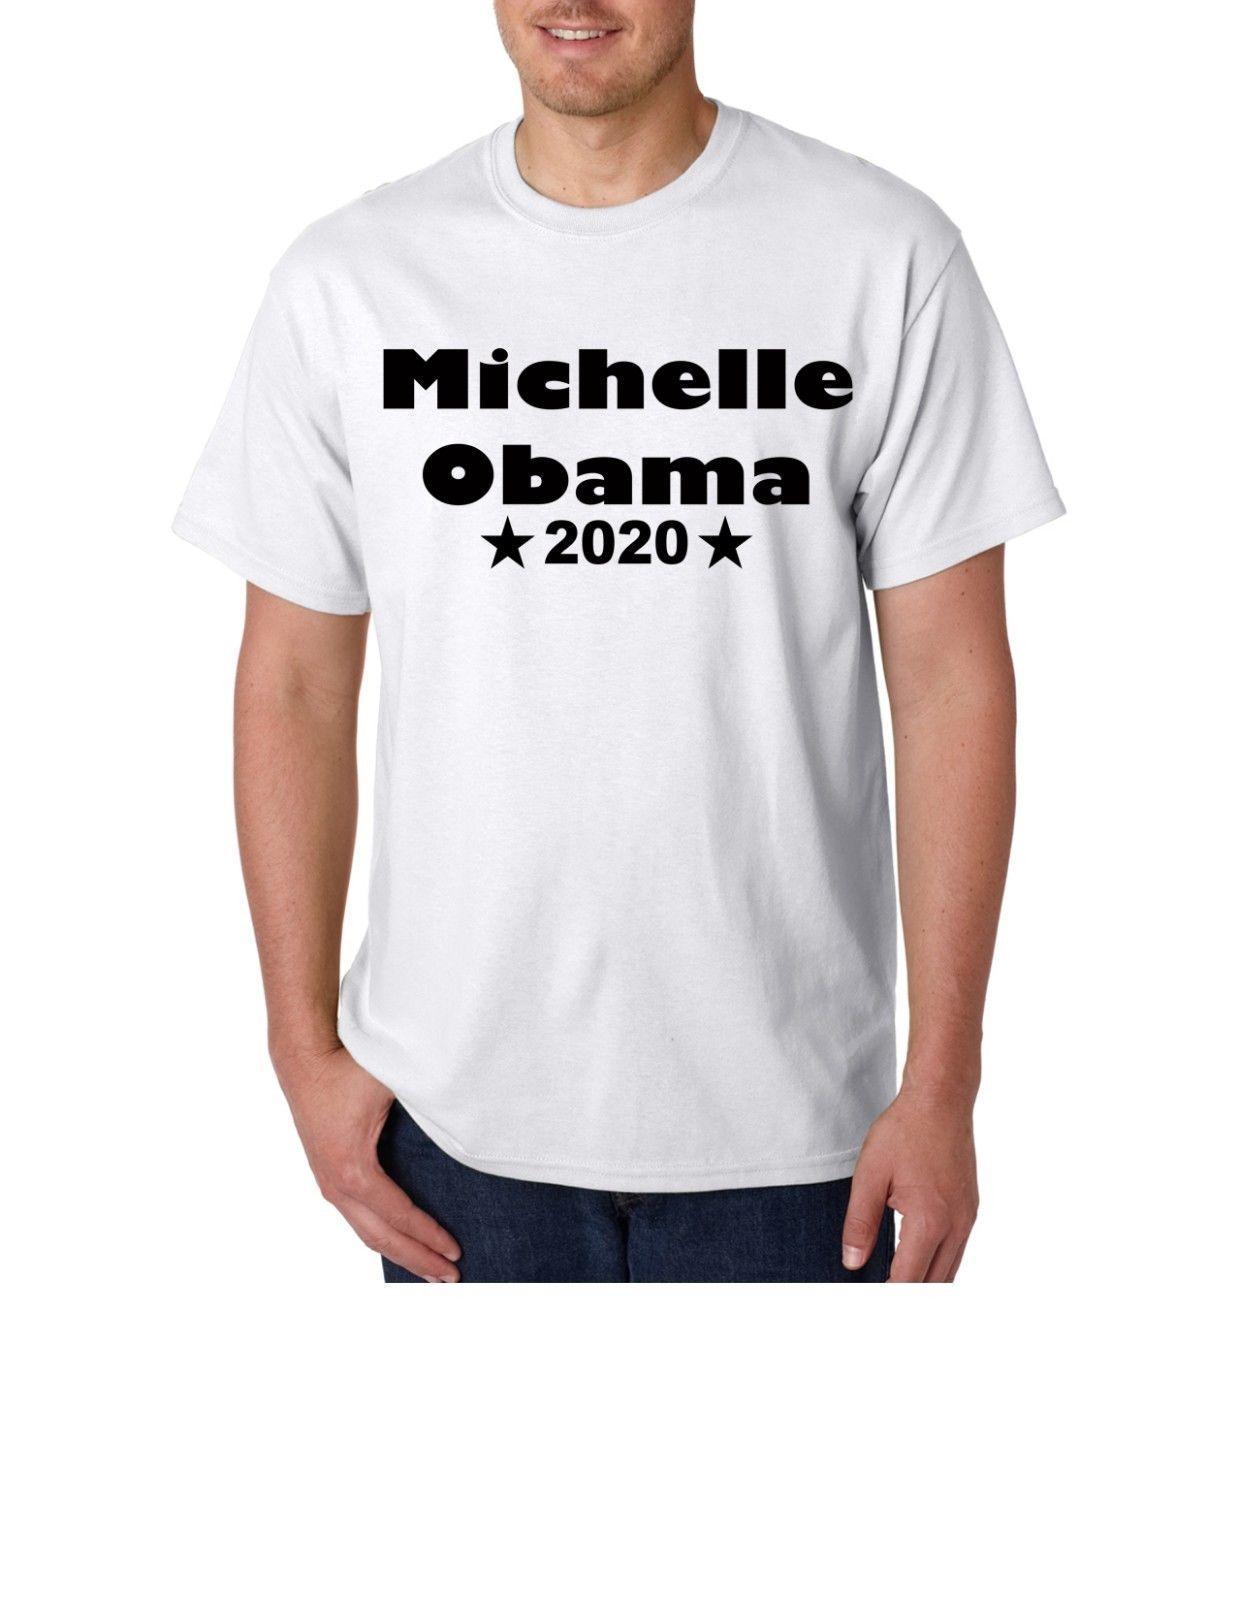 925edbae Michelle Obama 2020 Democrat Election Barack Unisex T Shirt Funny 100%  Cotton T Shirt Harajuku Summer 2018 Funky T Shirts Online Shirts Mens From  Darkcup, ...